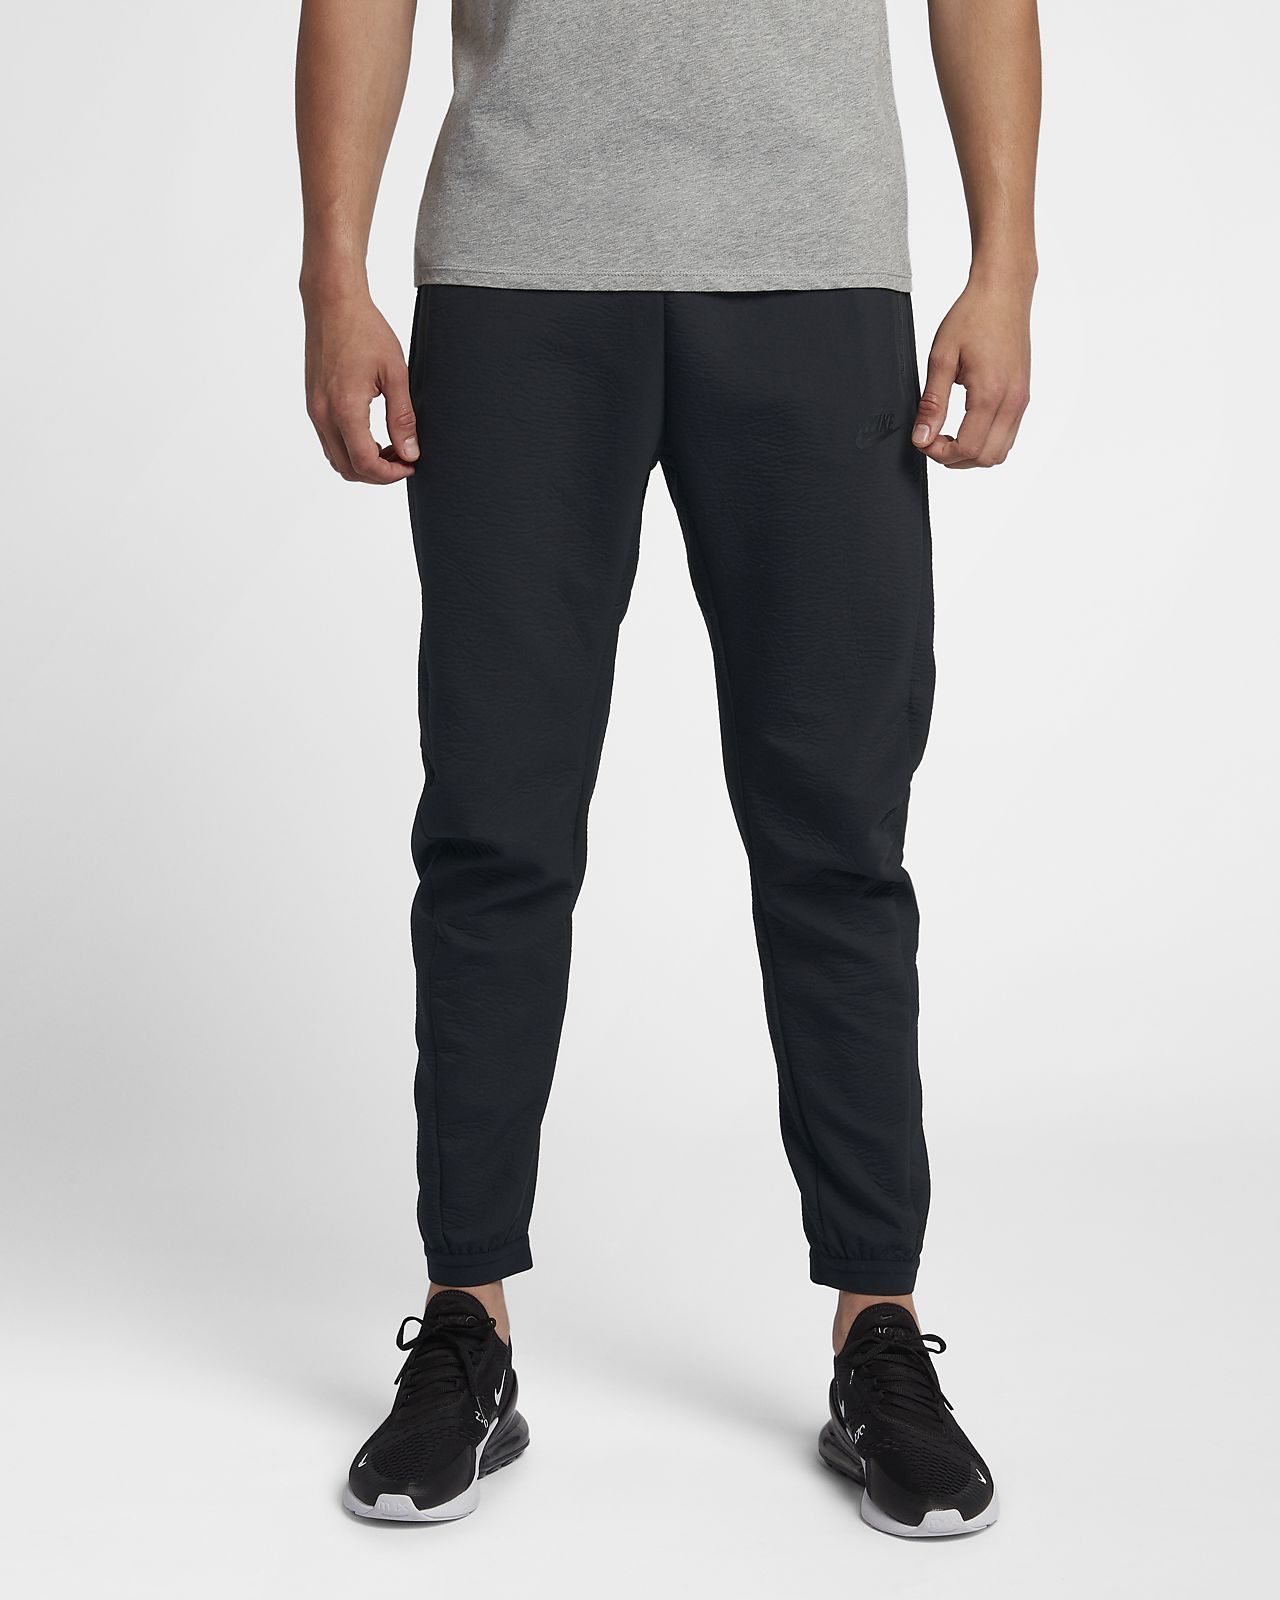 0005c6ad7 Nike Sportswear Tech Pack Woven Tracksuit Bottoms. Nike.com AU